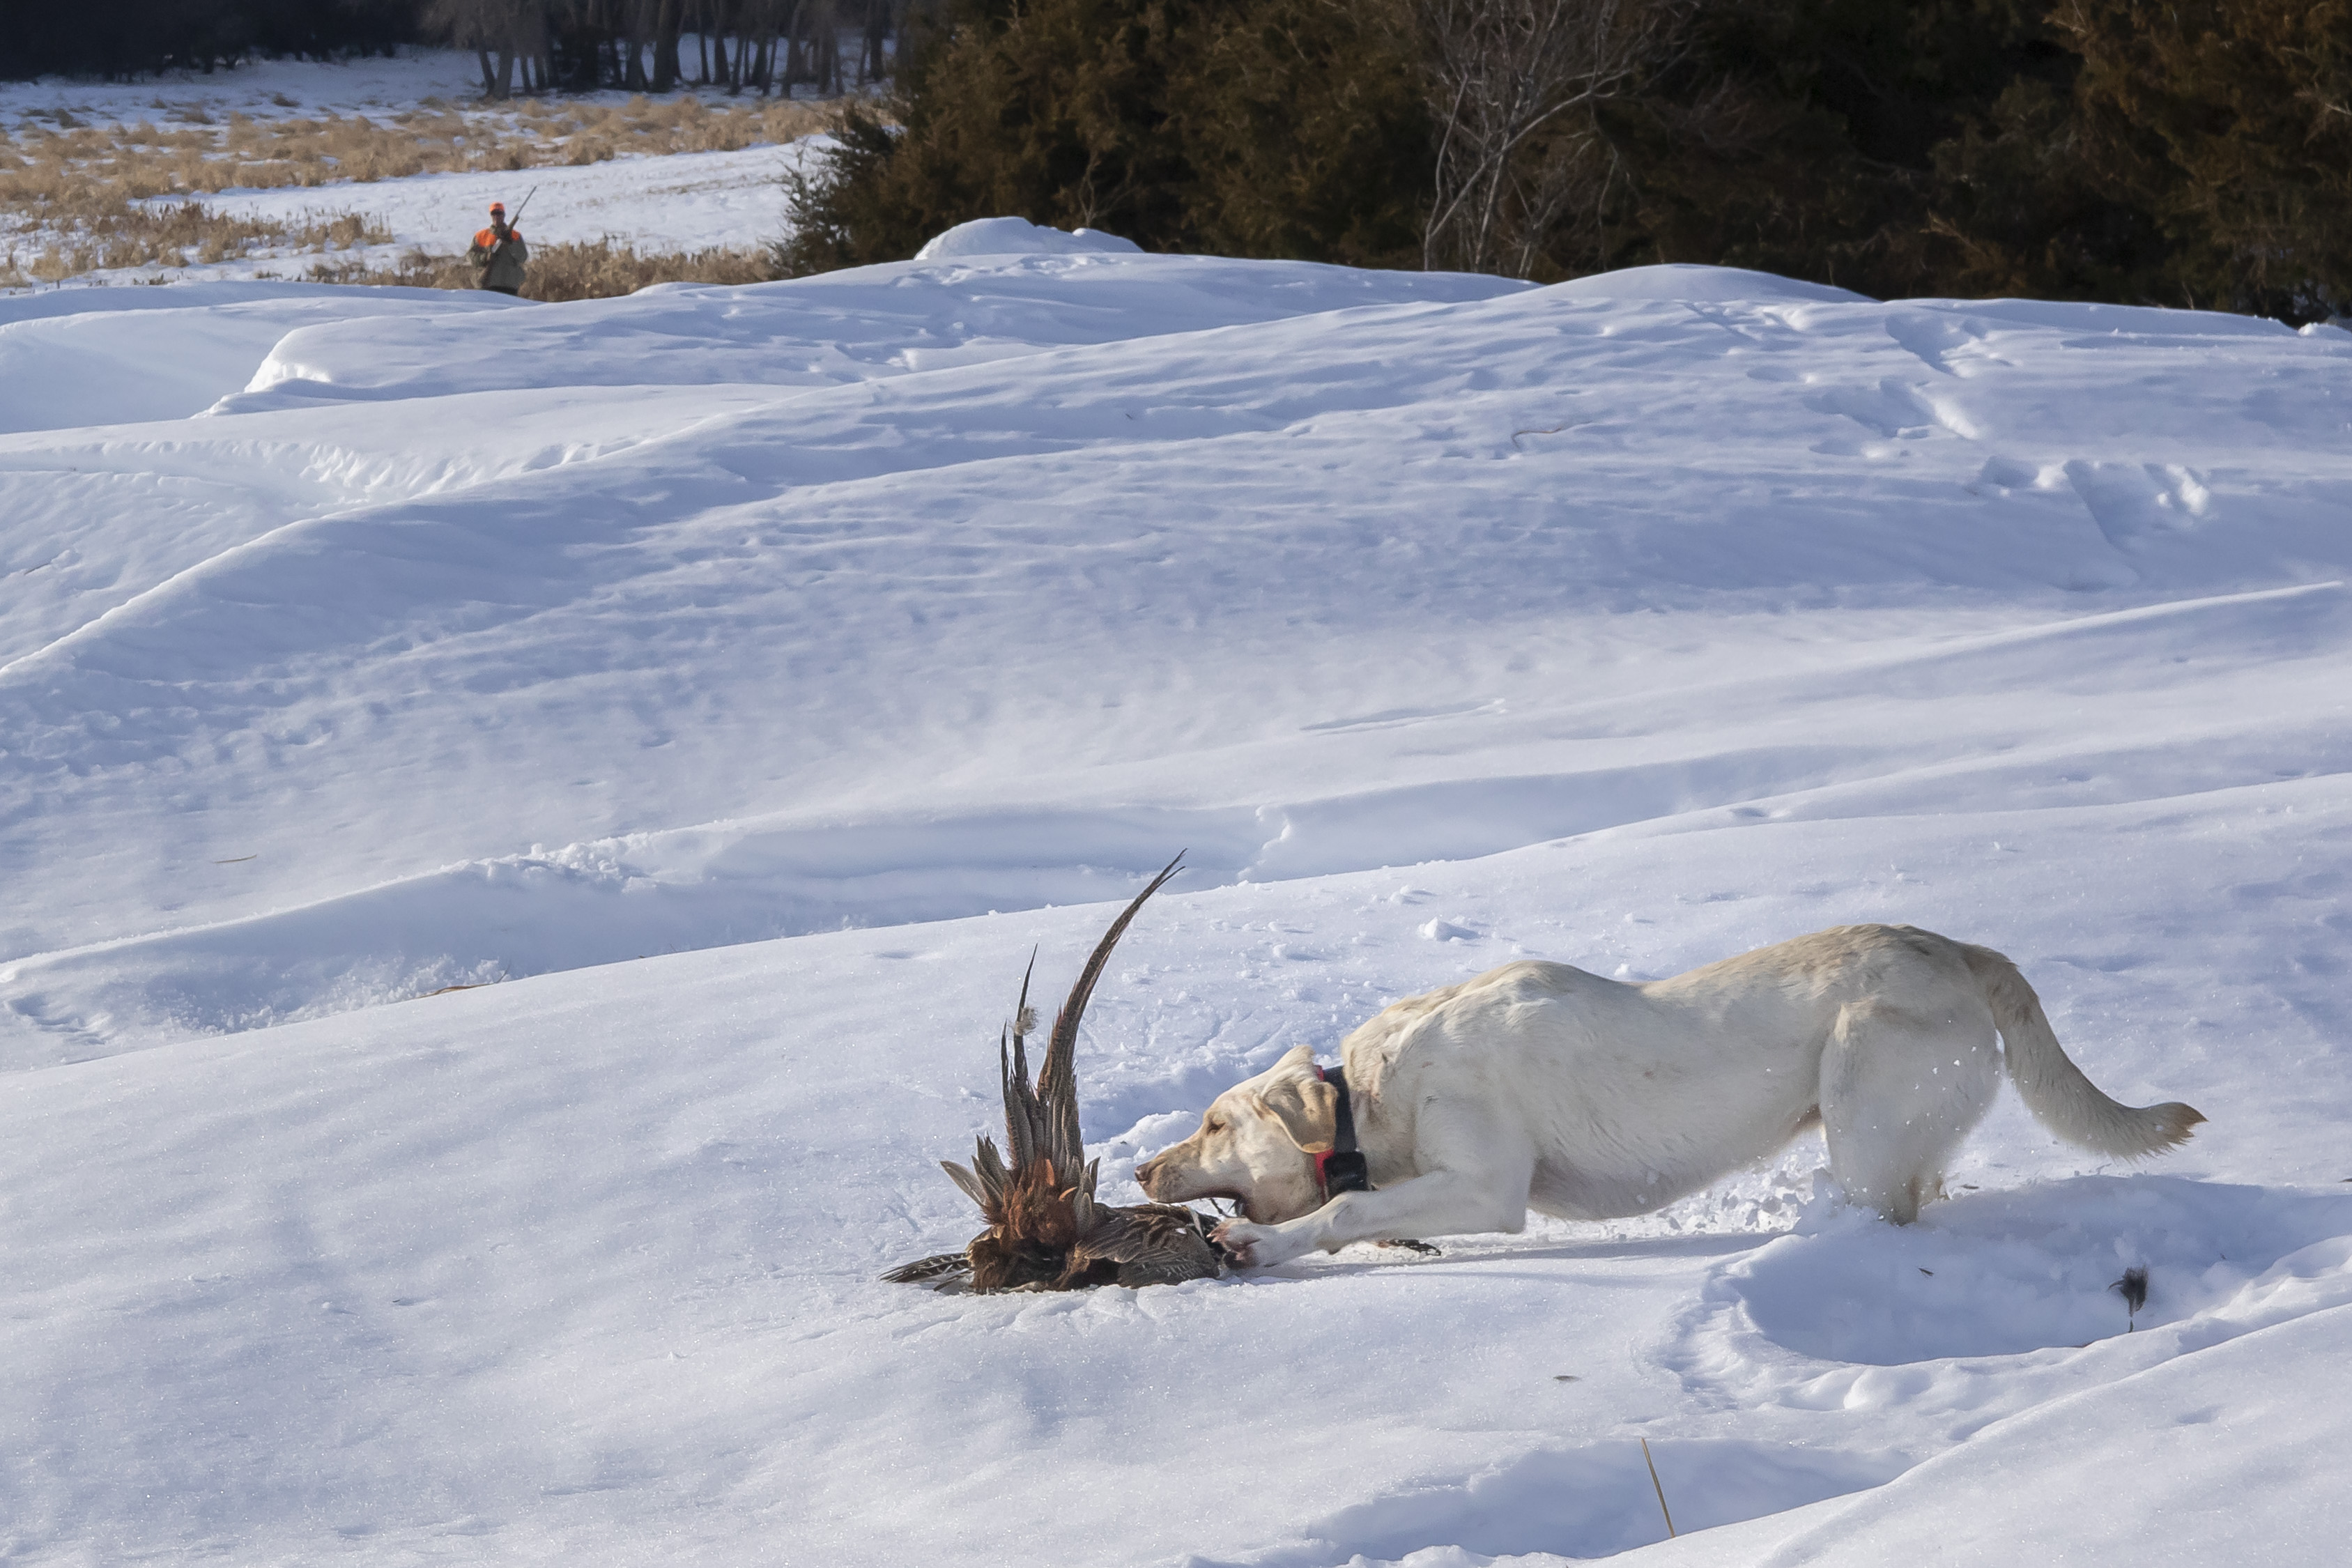 Pheasant retrieve in snow